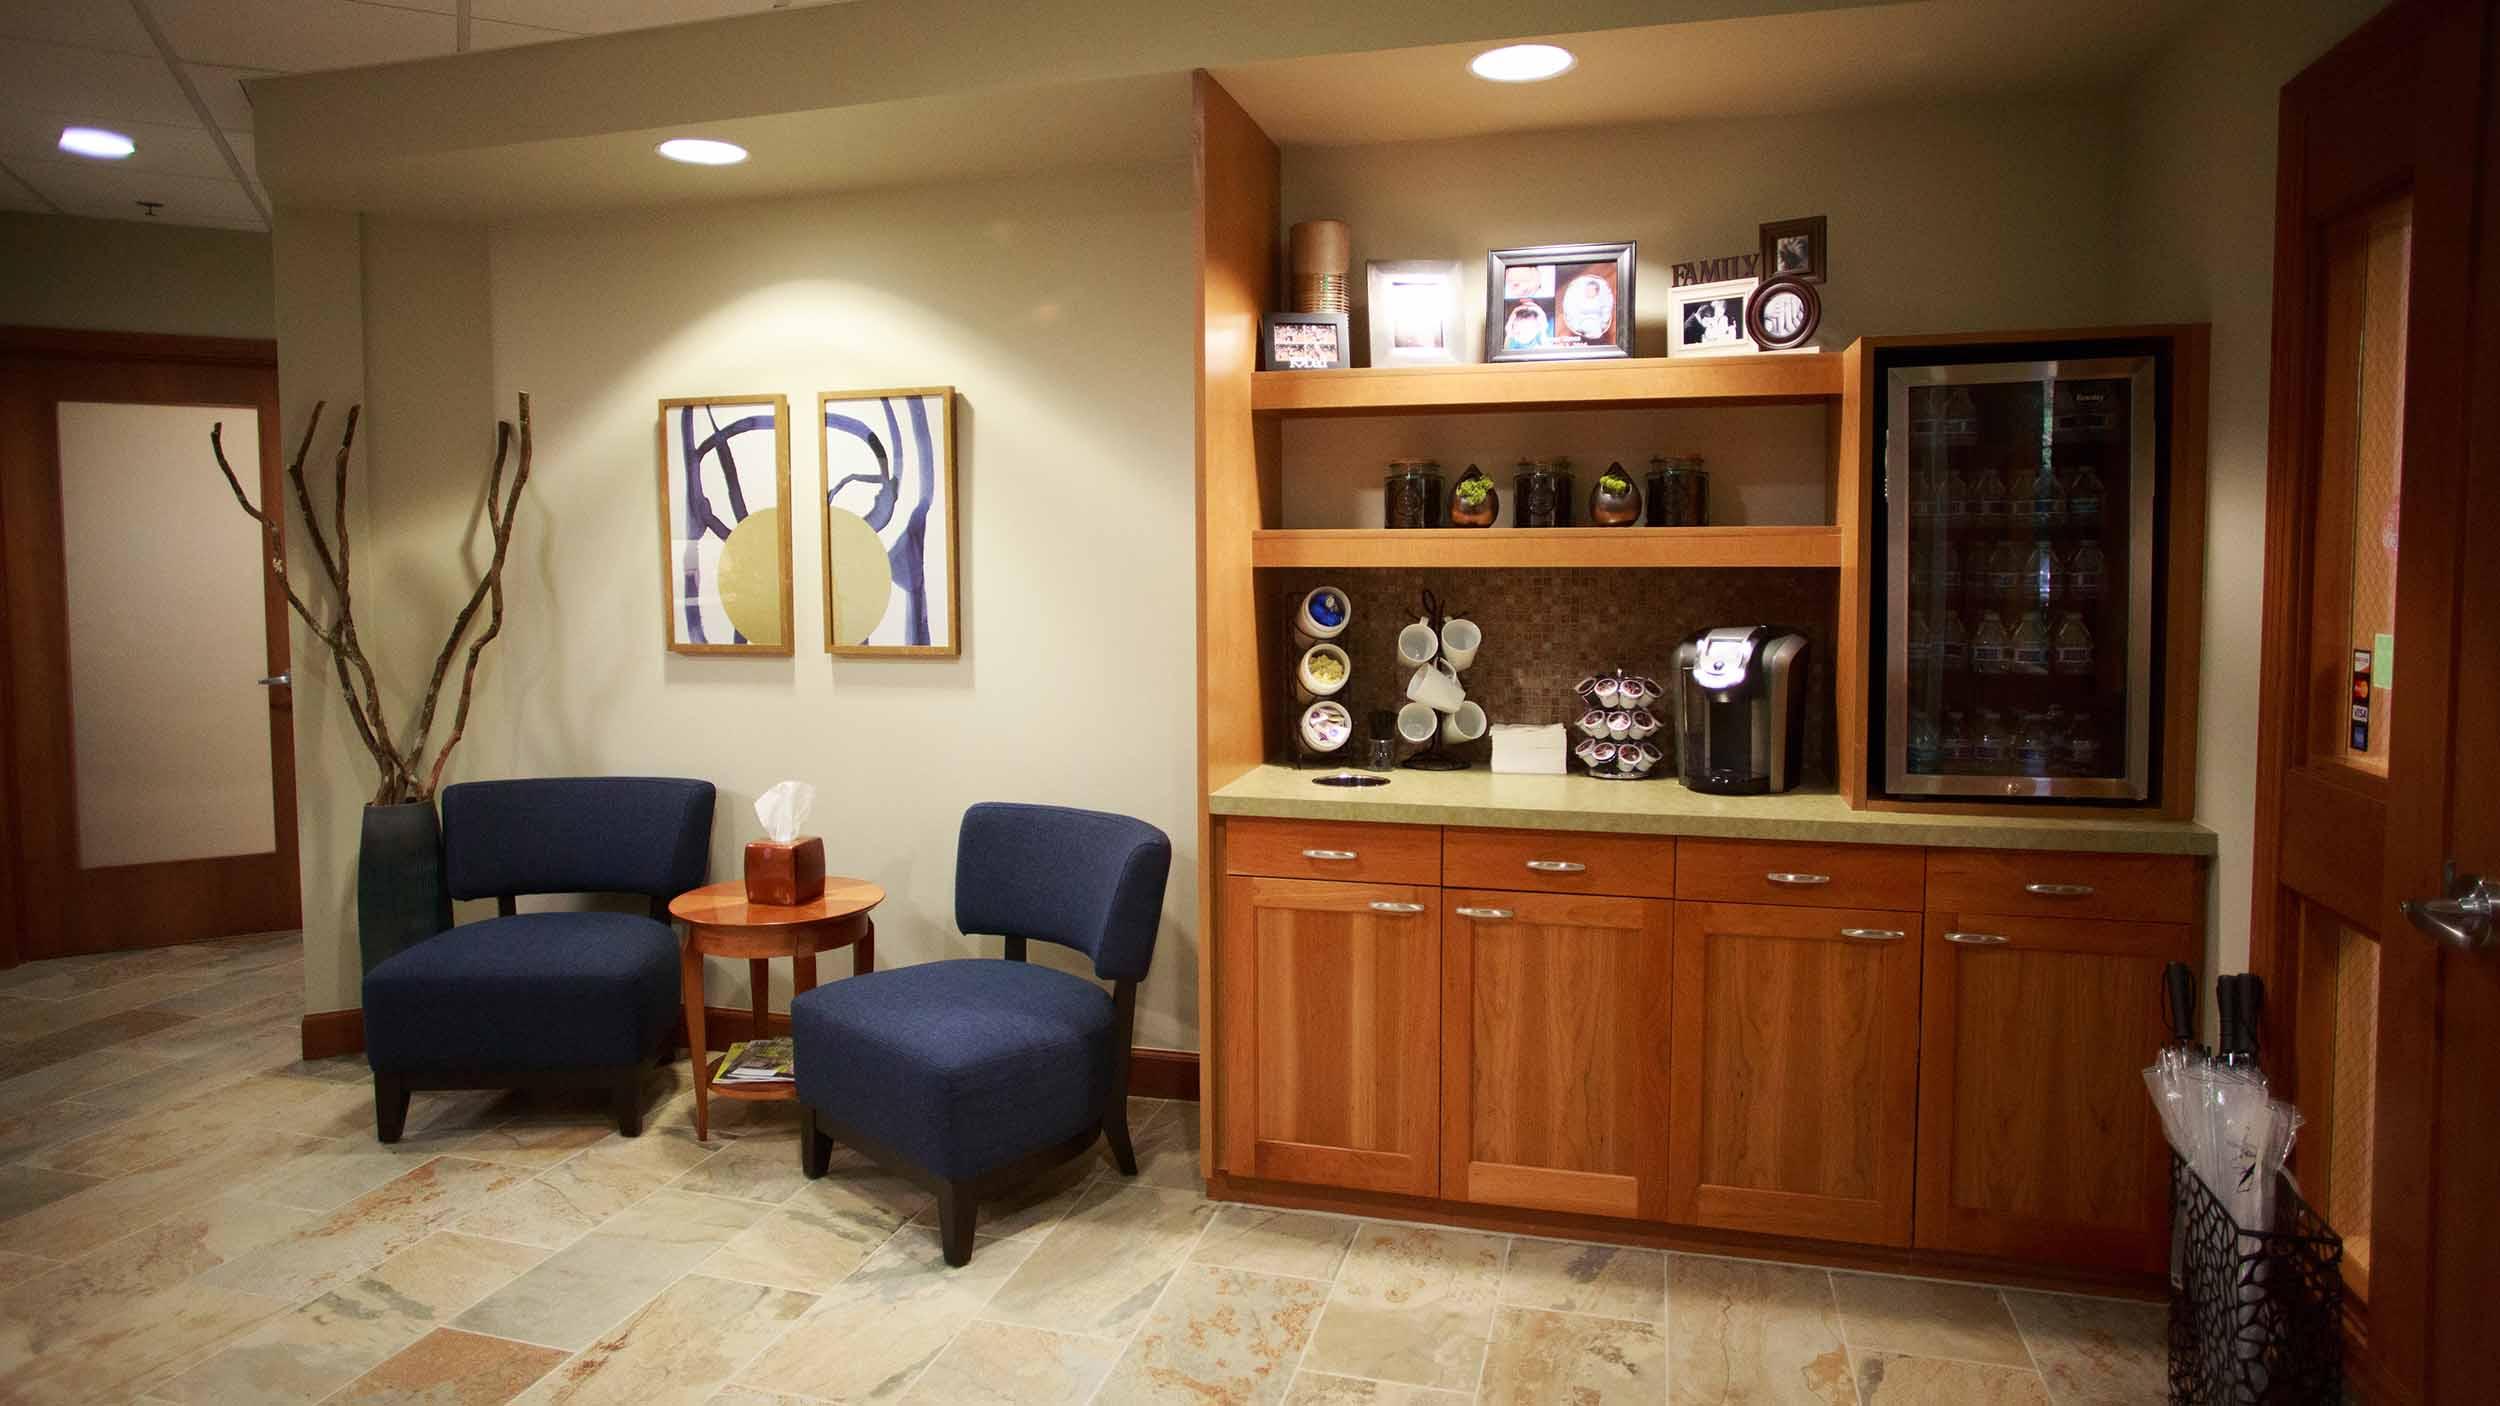 425 Dental Office Tour Web_0007_8-1690-DrOBldg.jpg